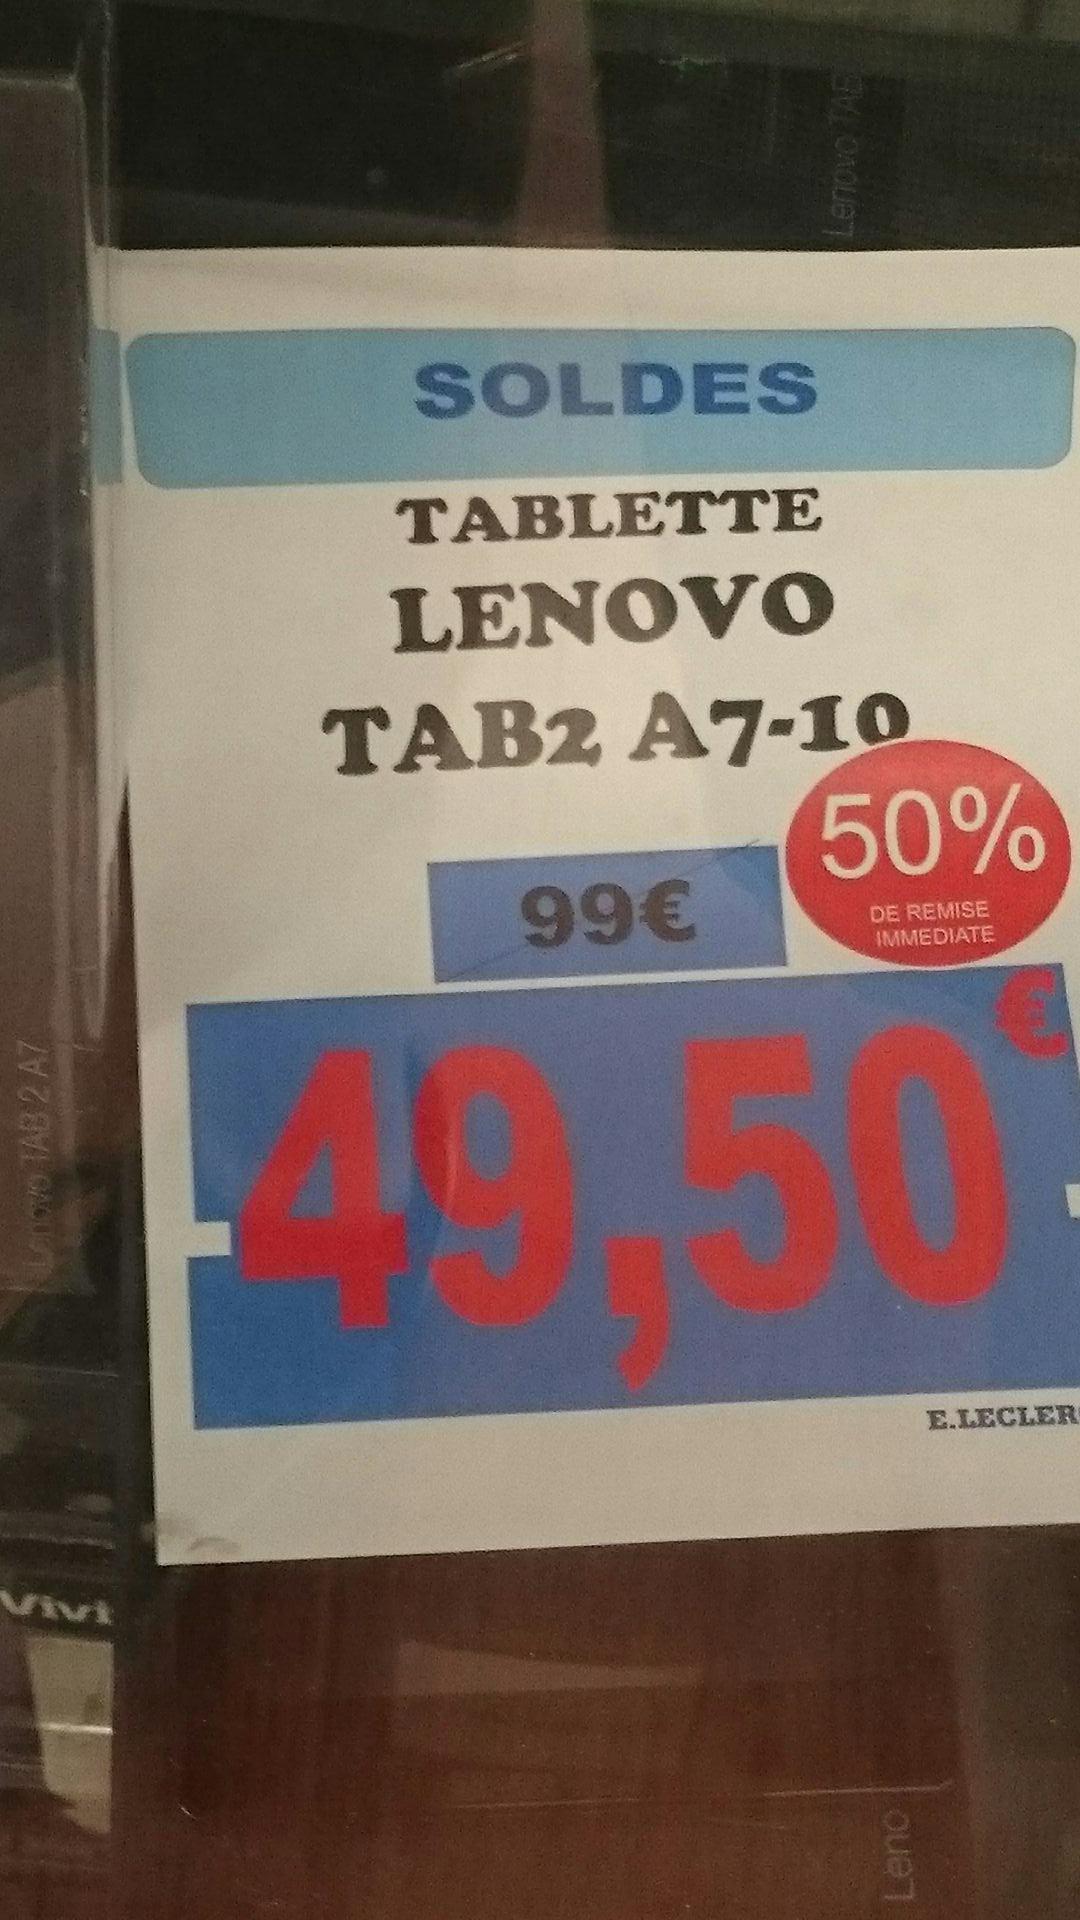 "Sélection de Tablettes Lenovo en solde - Ex: 7"" IdeaTab 2 A7-10 - RAM 1Go, 8Go (Via ODR 20€)"